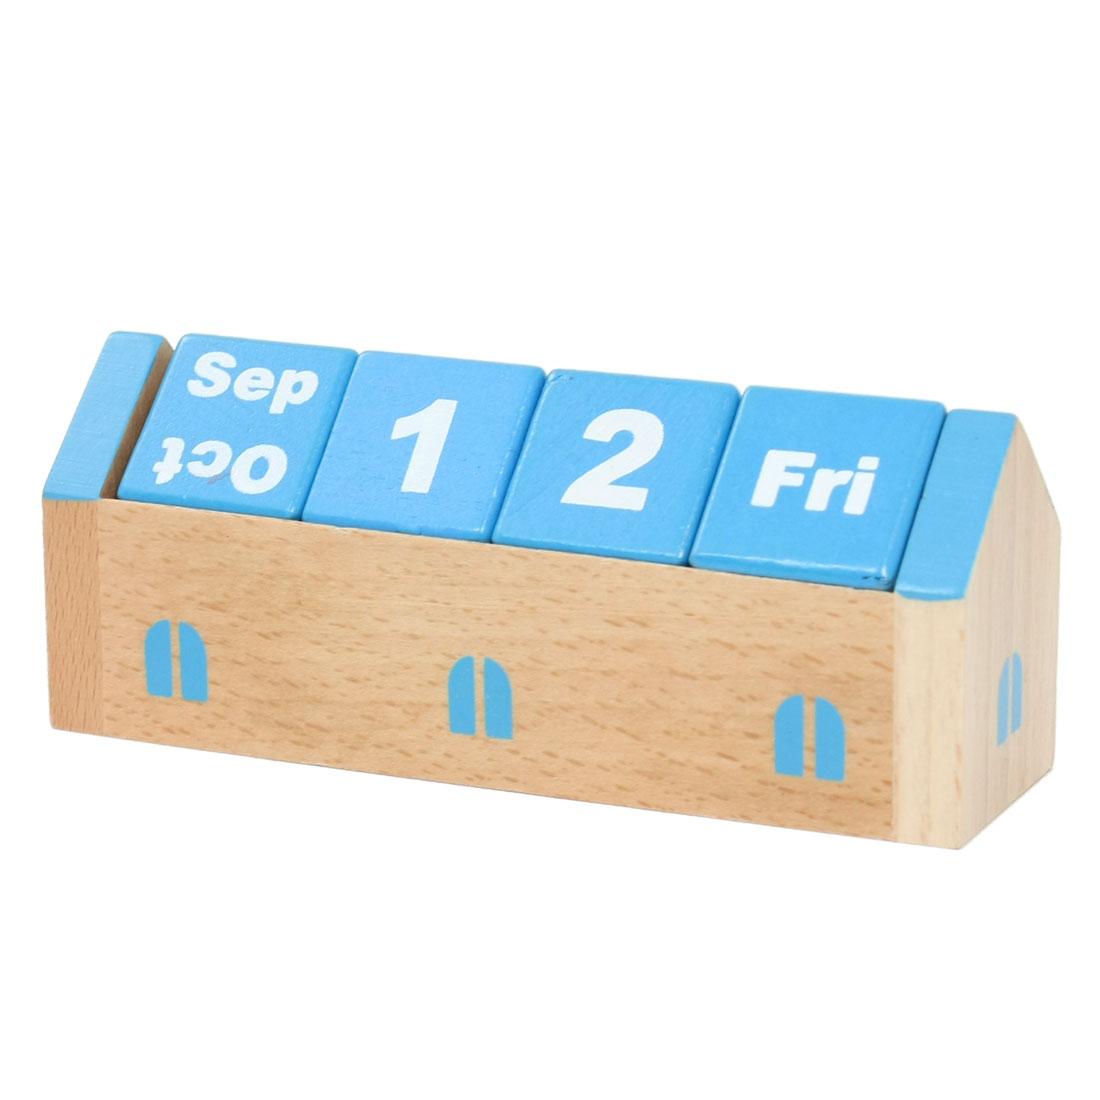 Home Family 3D DIY Perpetual Wood Desktop Calendar Teal Blue for Kids